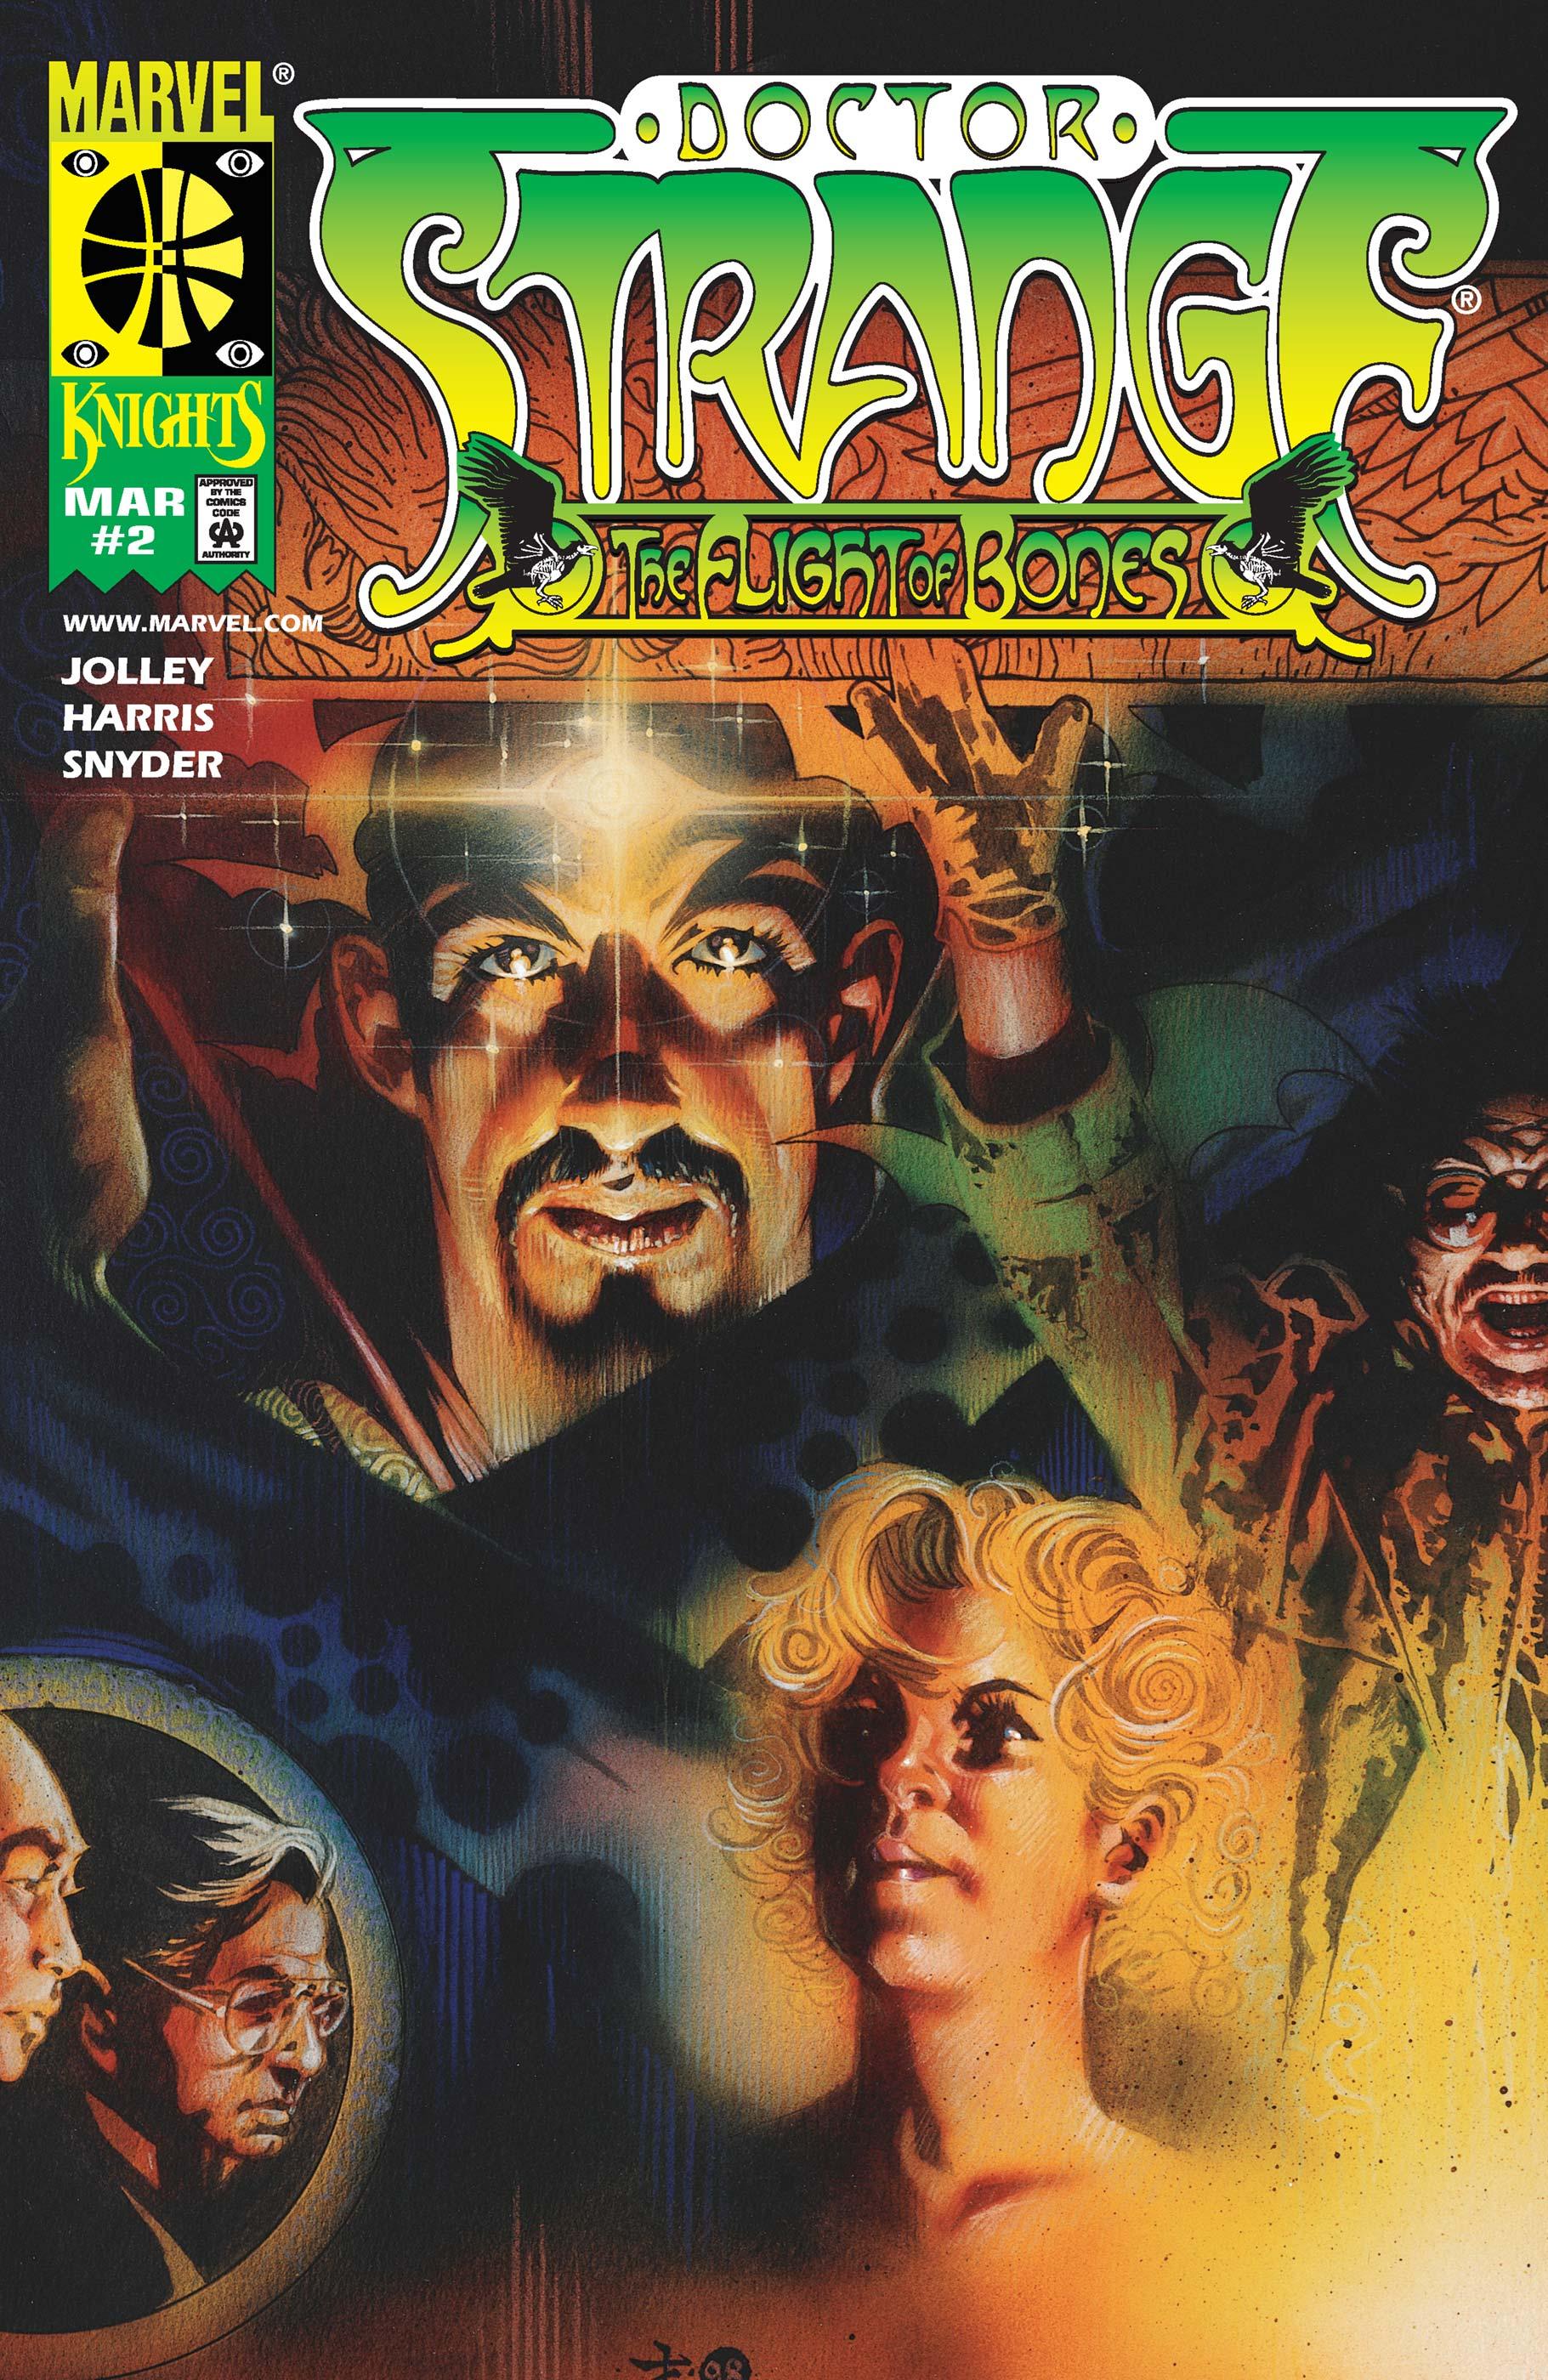 Doctor Strange: The Flight of Bones (1999) #2